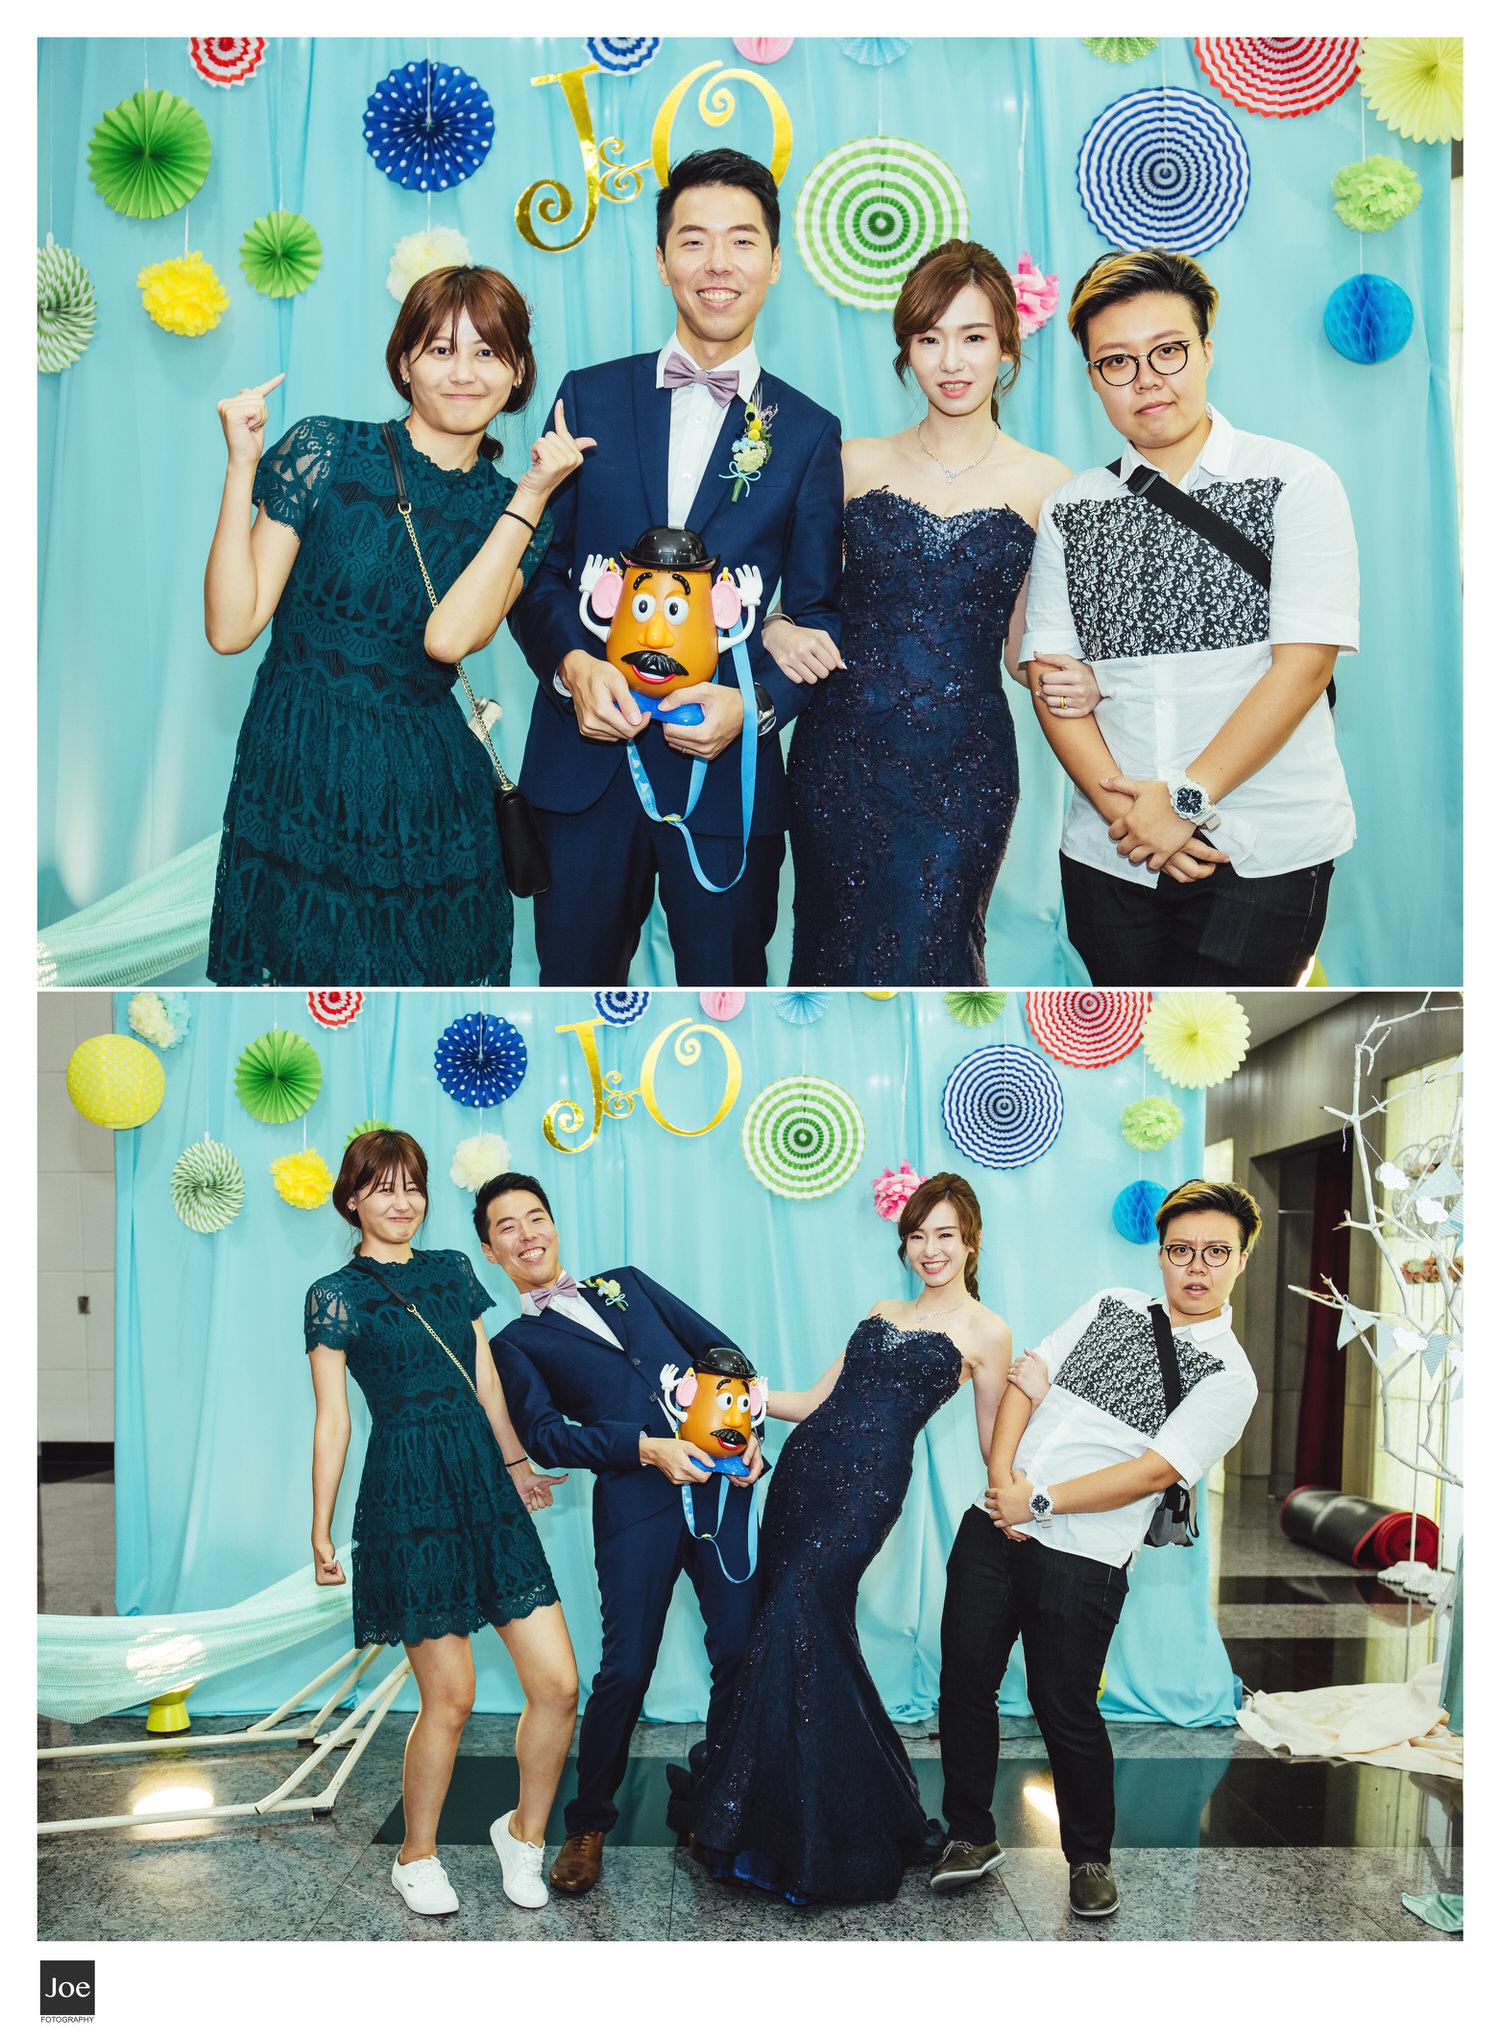 jc-olivia-wedding-122-liyan-banquet-hall-joe-fotography.jpg